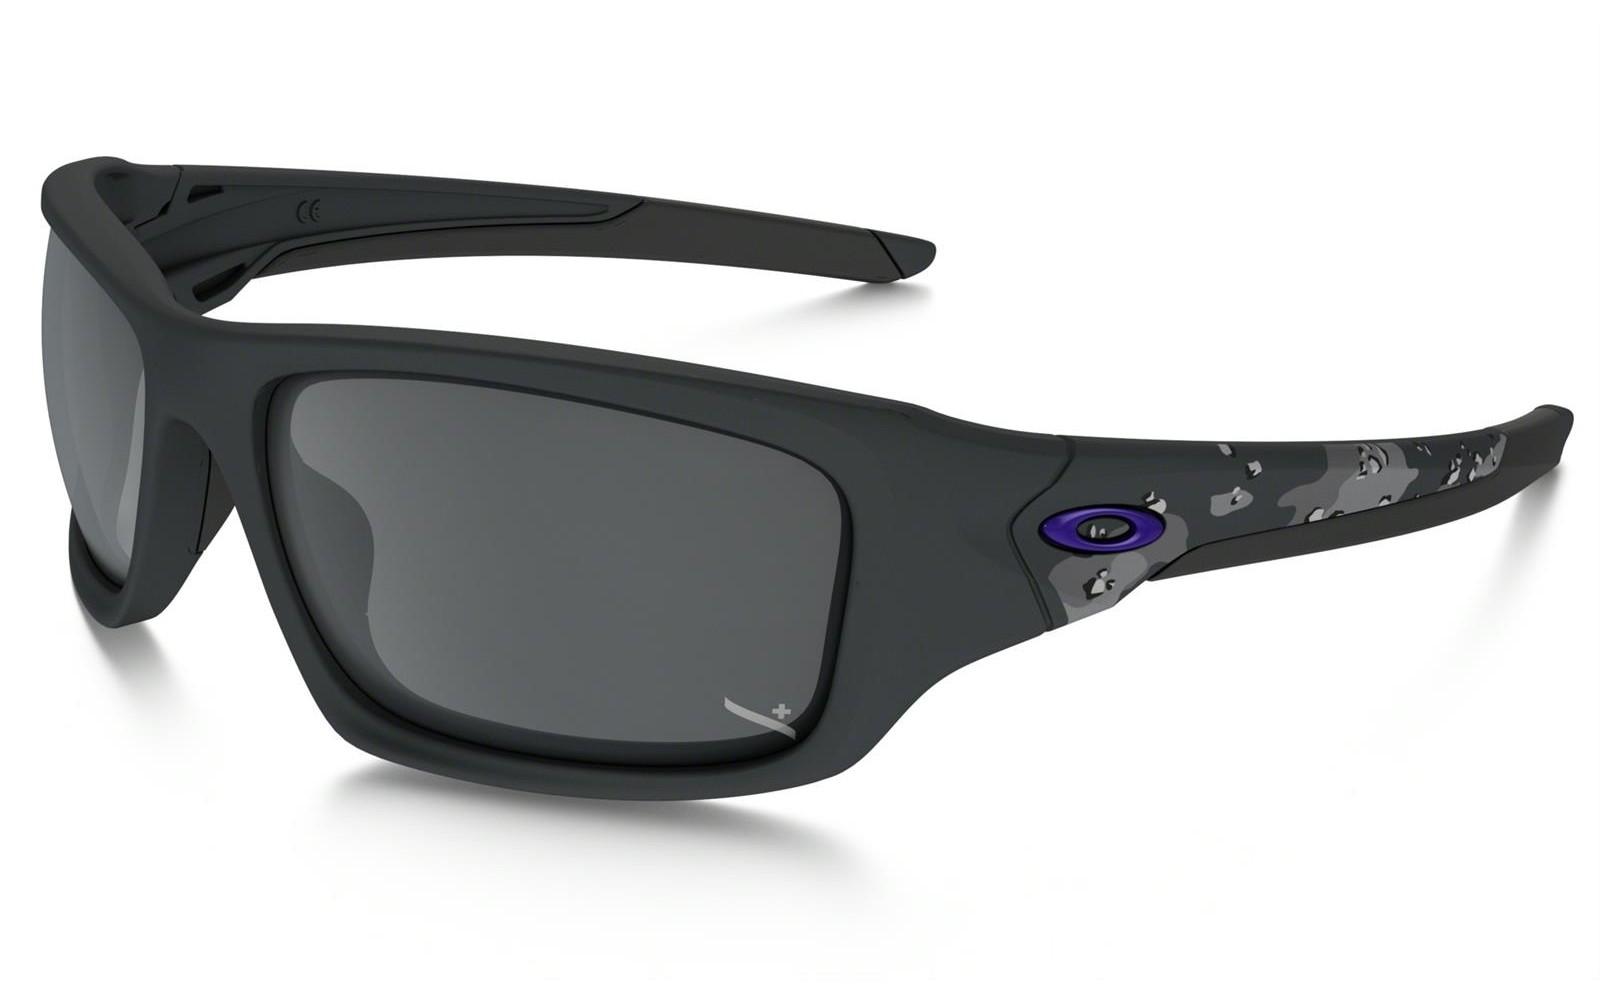 Oakley Infinite Hero Collection Valve - Matte Carbon Camo / Black Iridium - OO9236-21 Zonnebril